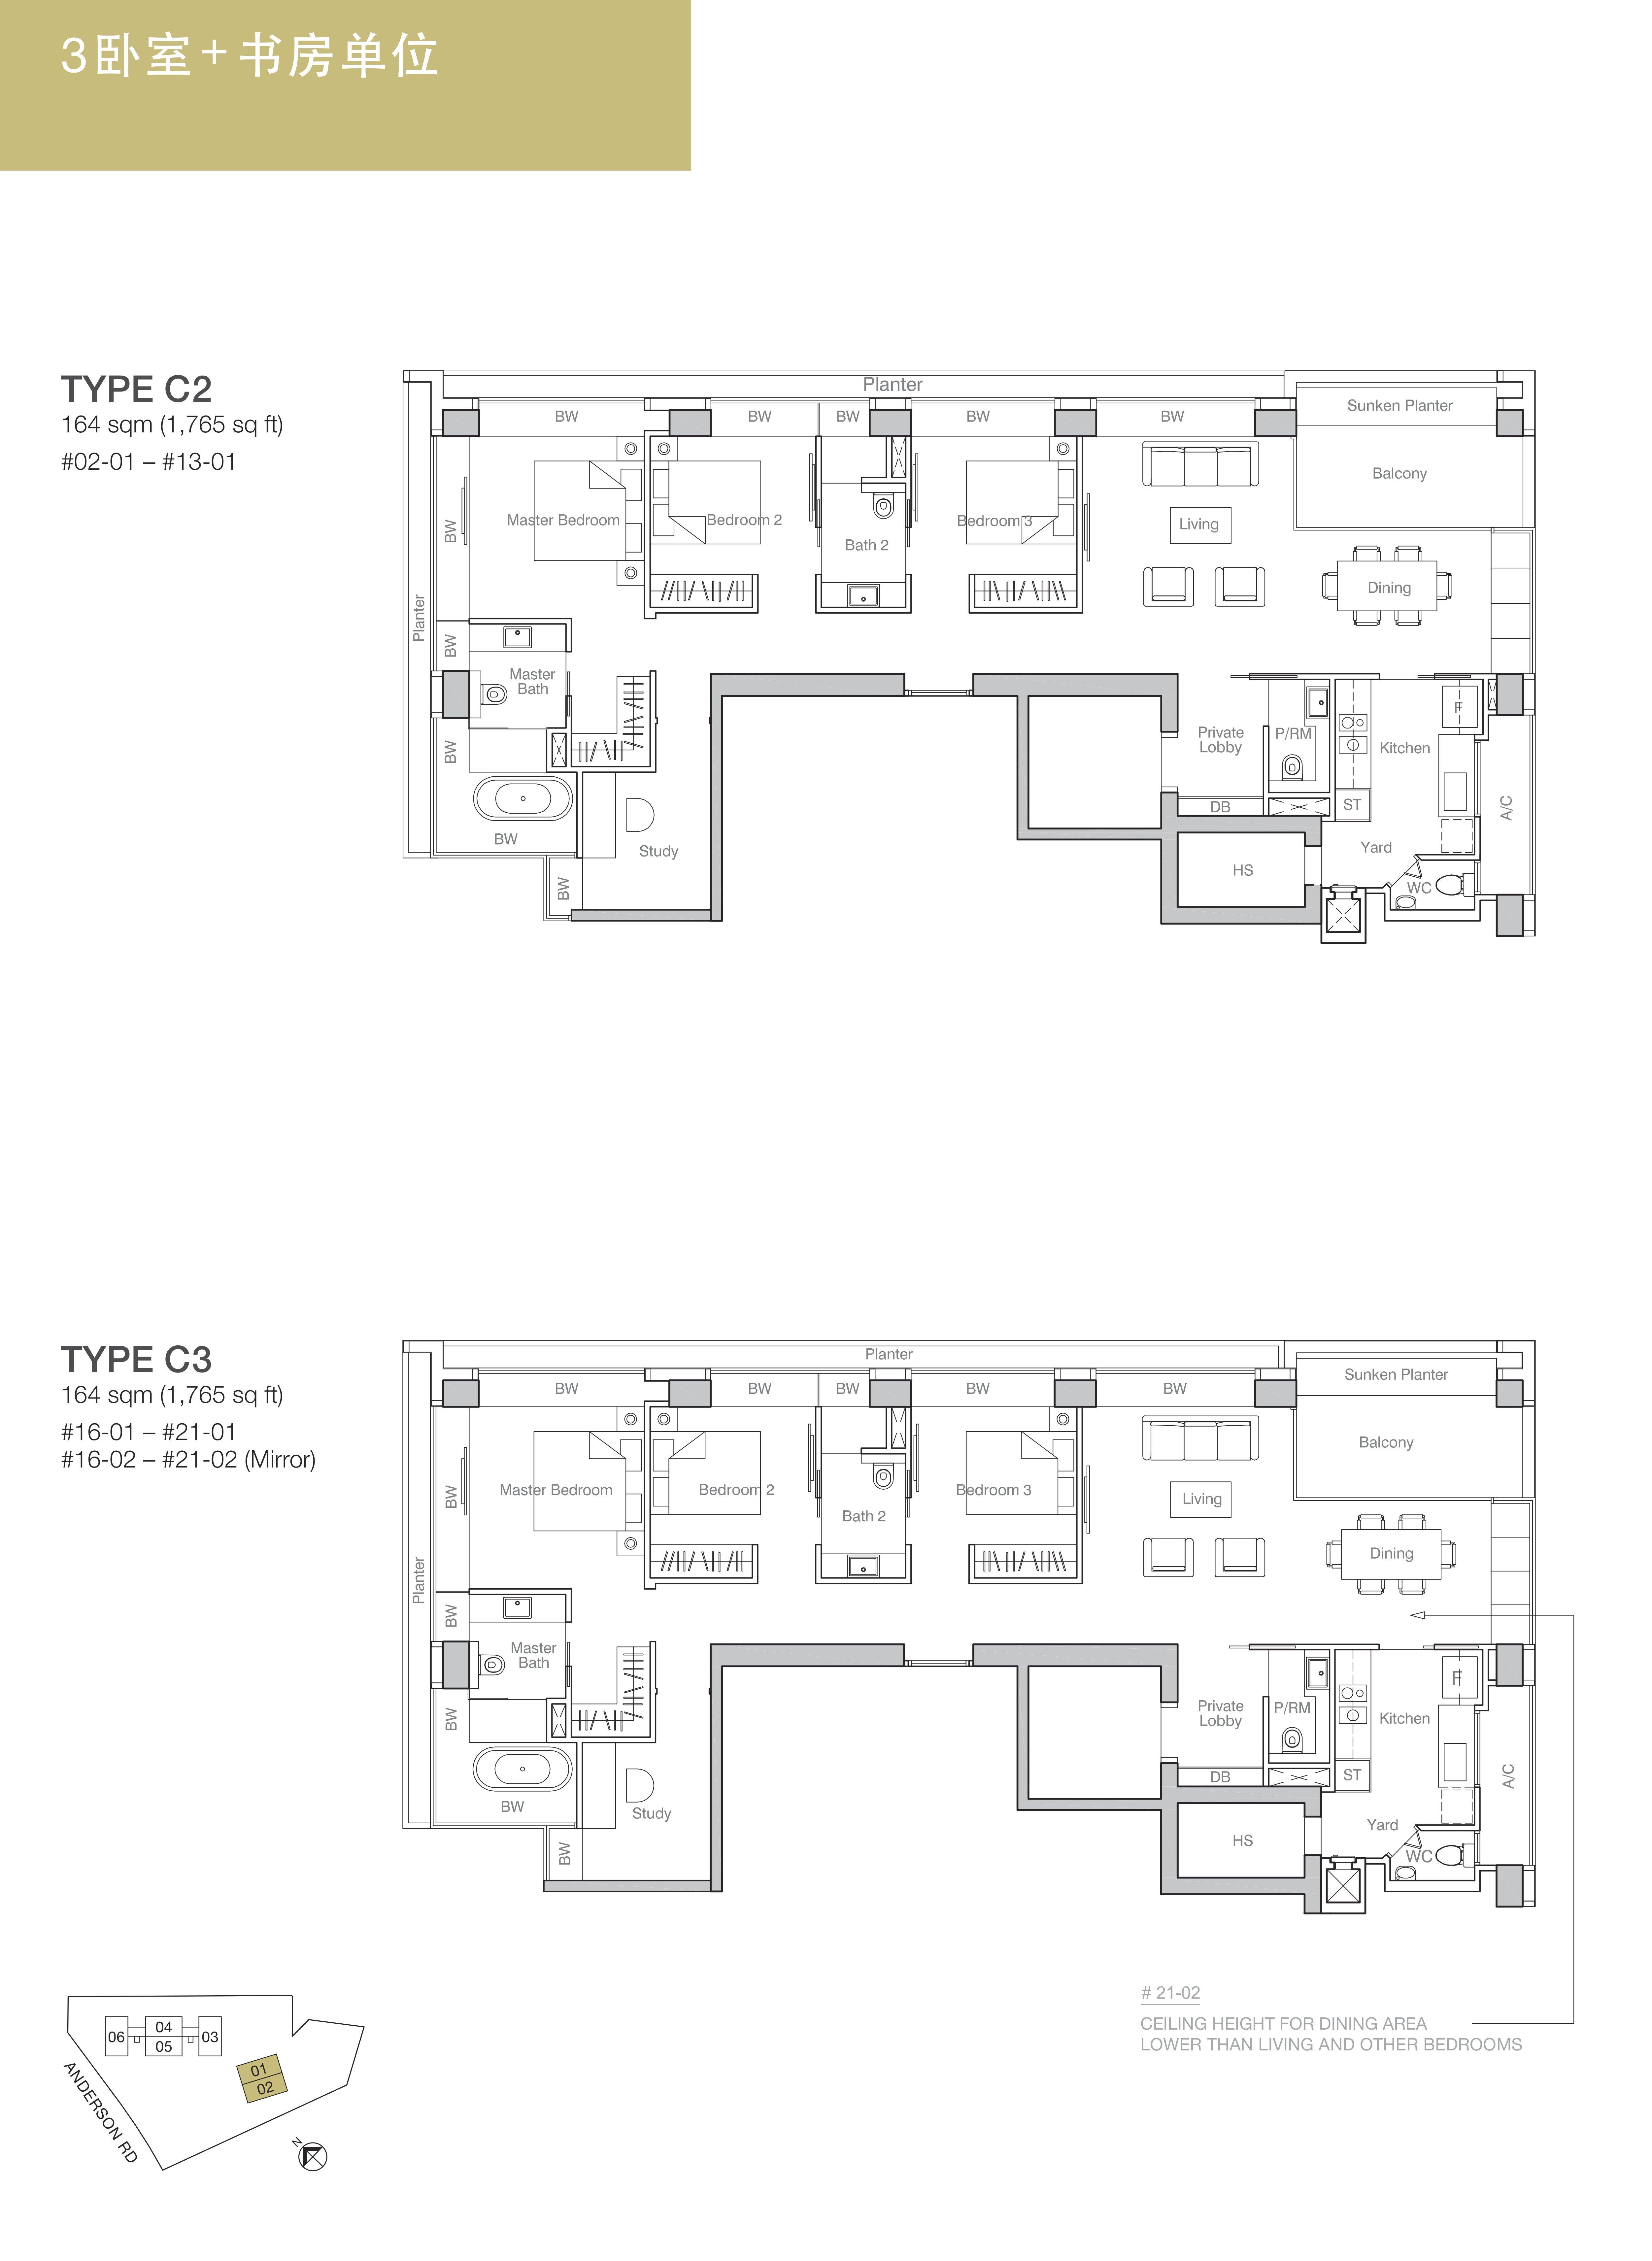 Nouvel 18 明筑公寓 -floor plan 3卧房+书房 c2 c3